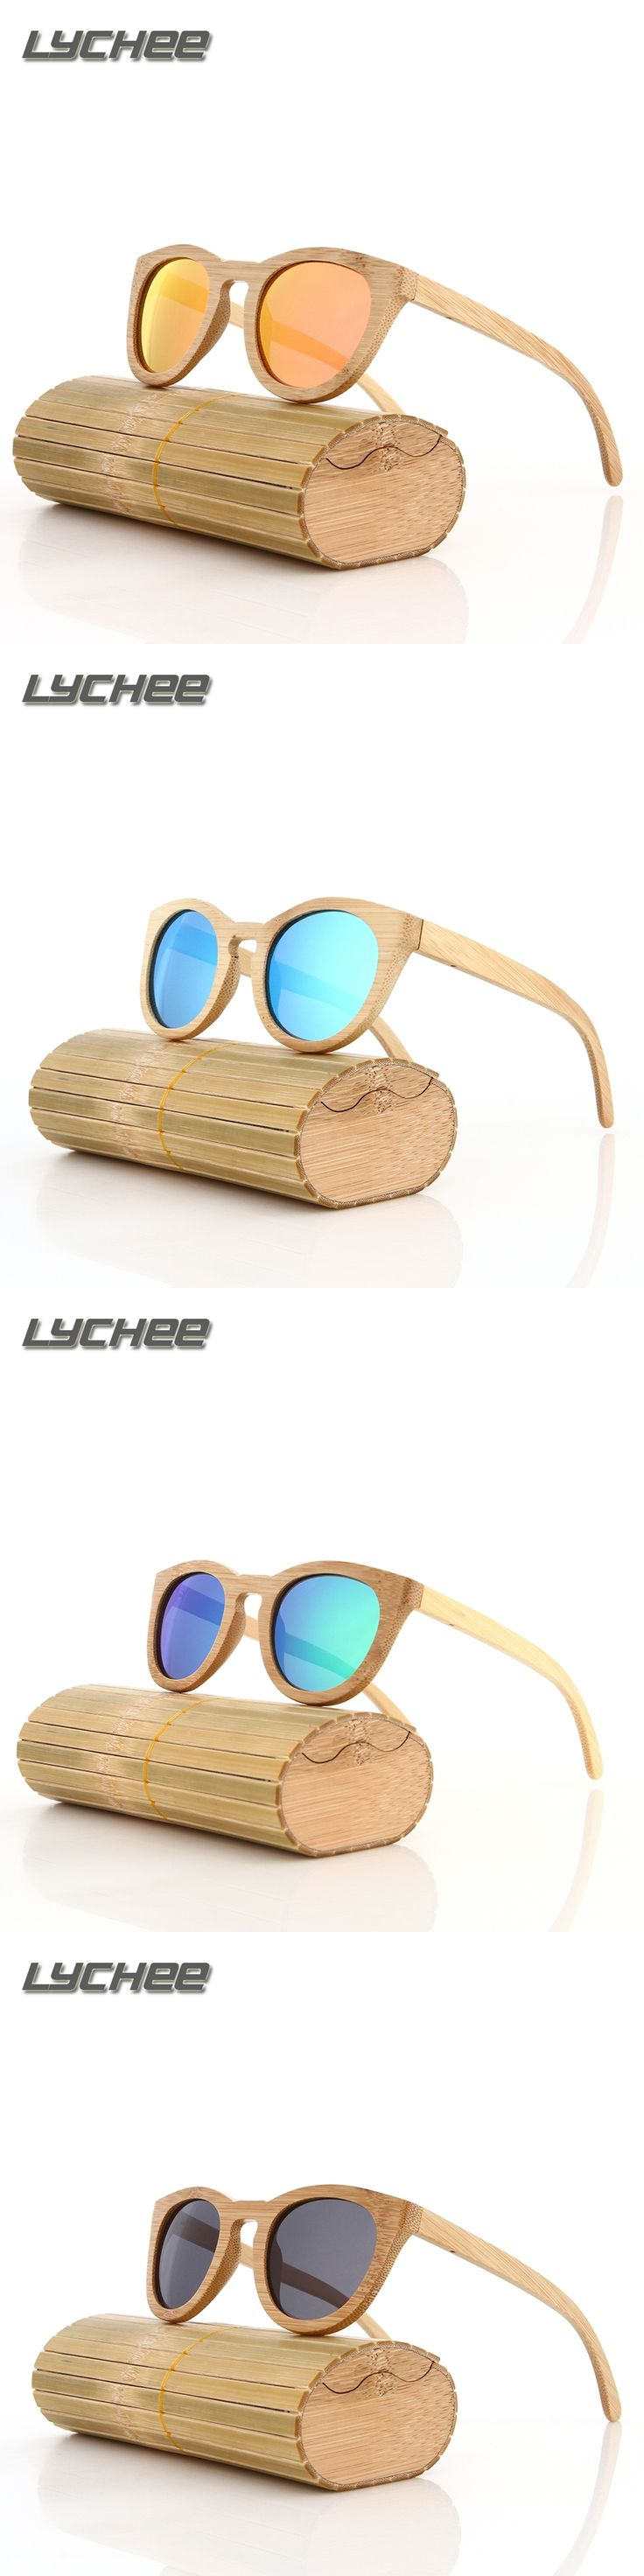 LYCHEE 2016 Bamboo Sunglasses Men Wooden glasses Women Brand Designer Original Wood Sun Glasses fo Women/Men Oculos de sol mascu